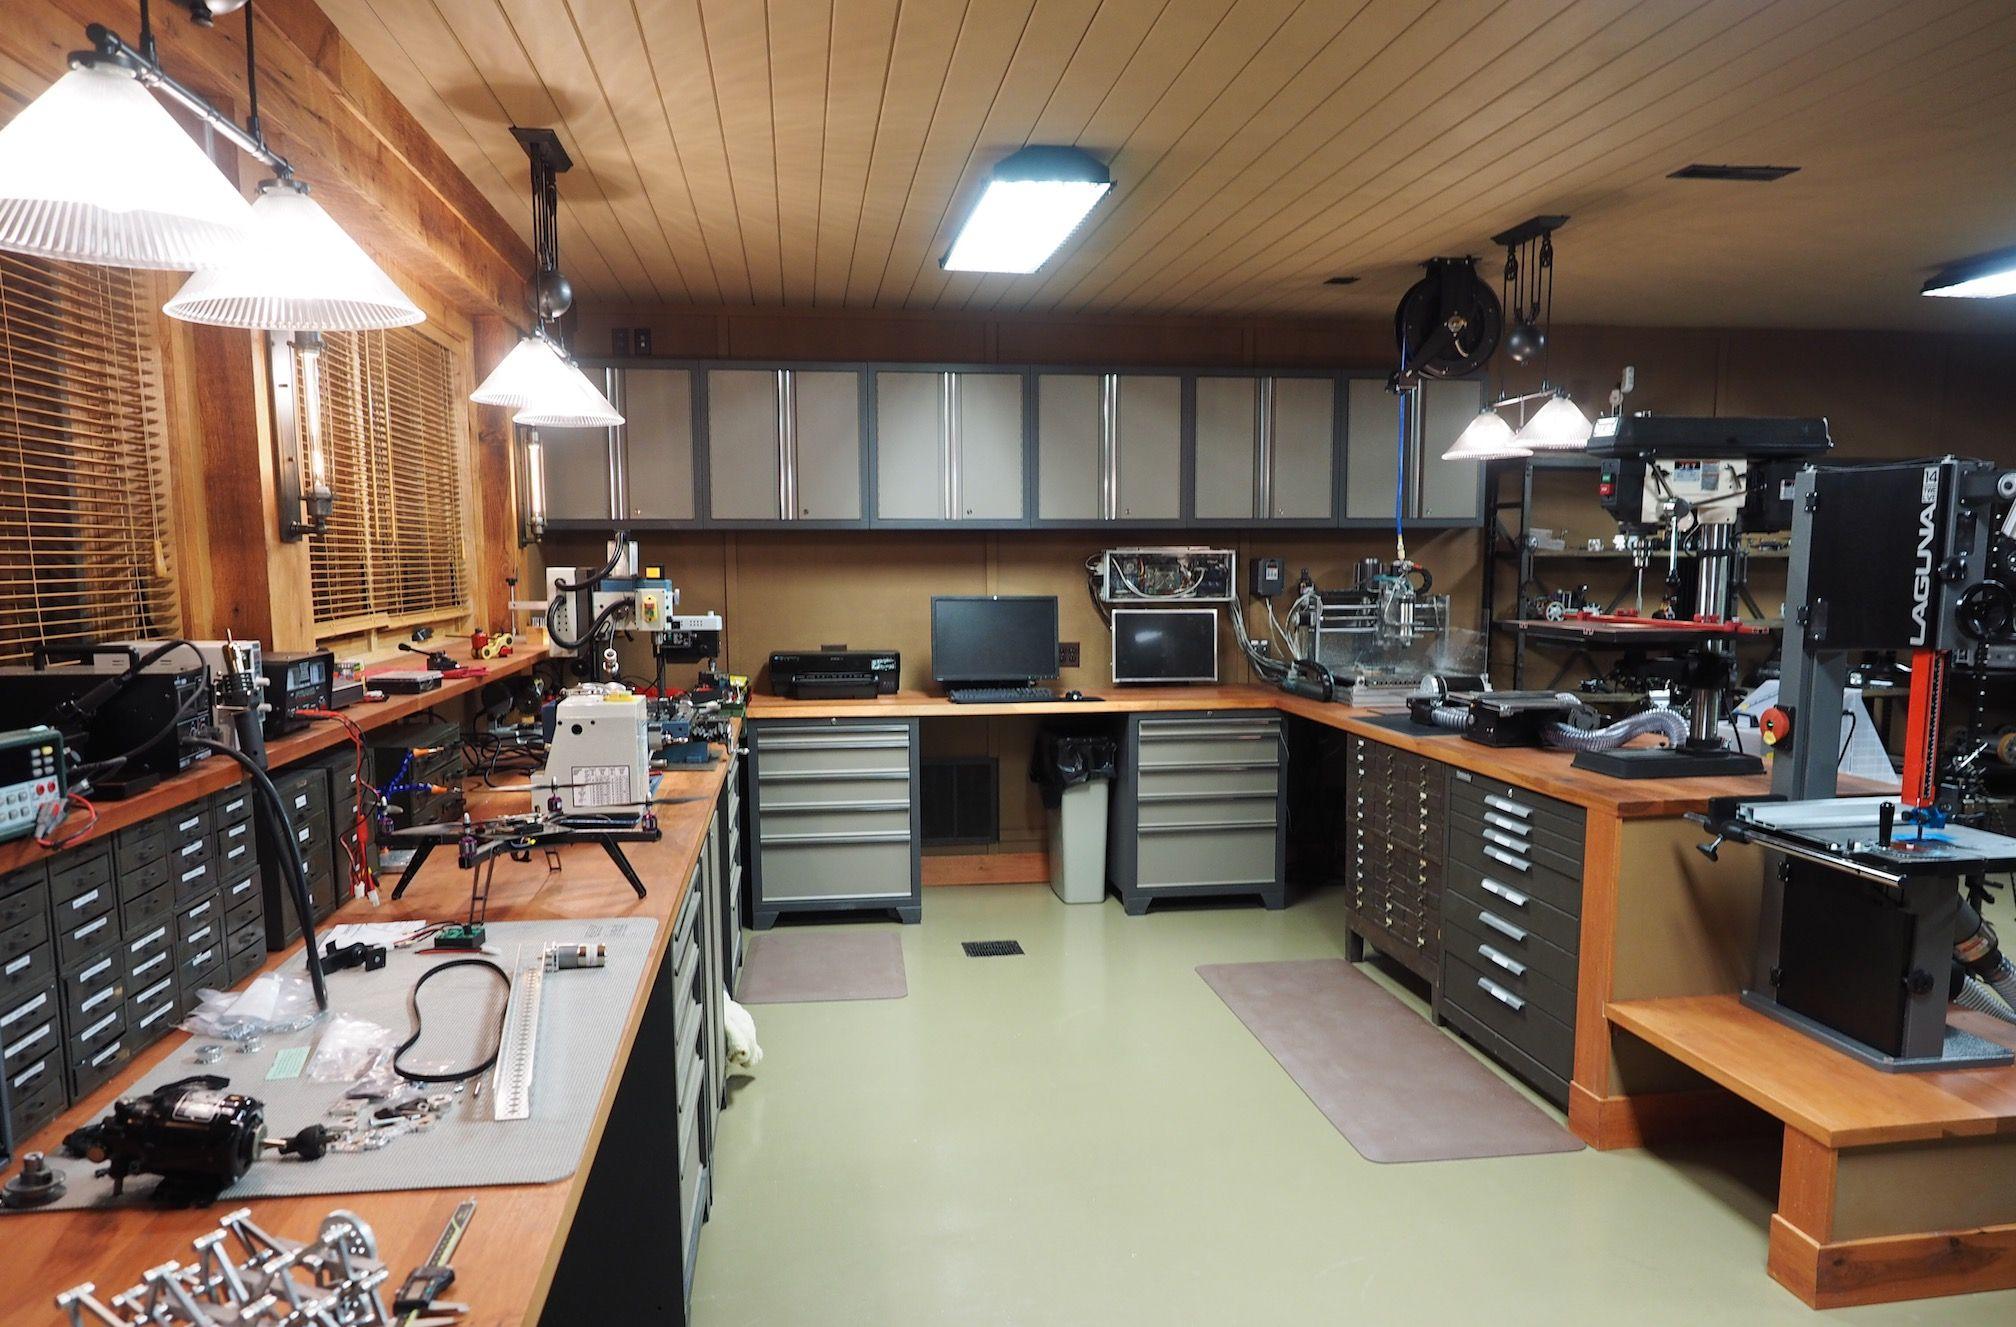 Workshop Tool Photos Categories Basement Workshop Garage Workshop Garage Workshop Layout